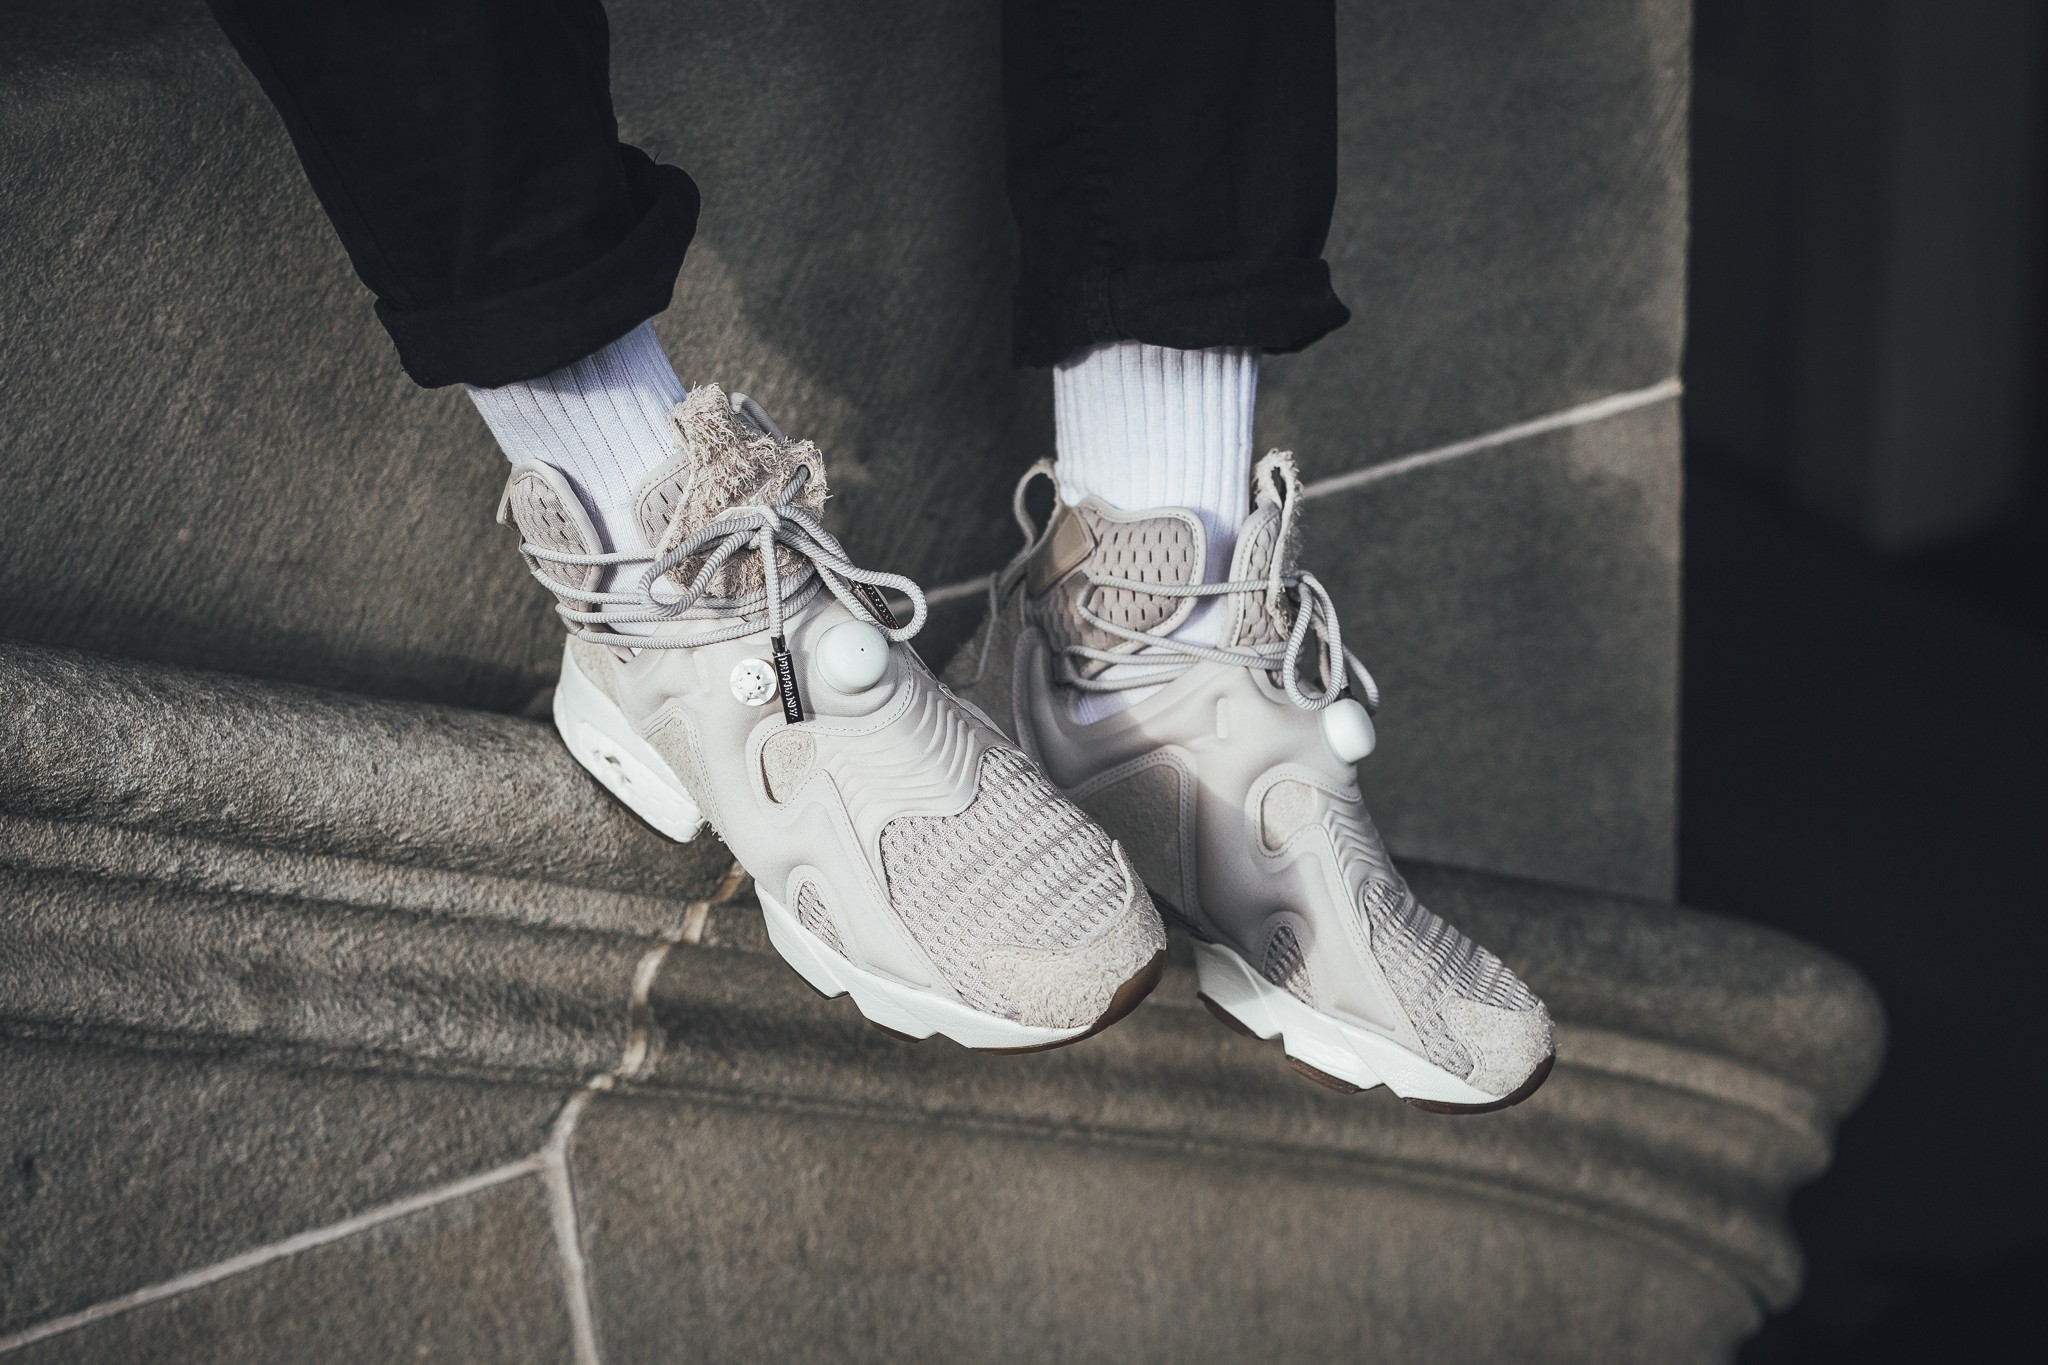 future x reebok shoes aimas.it